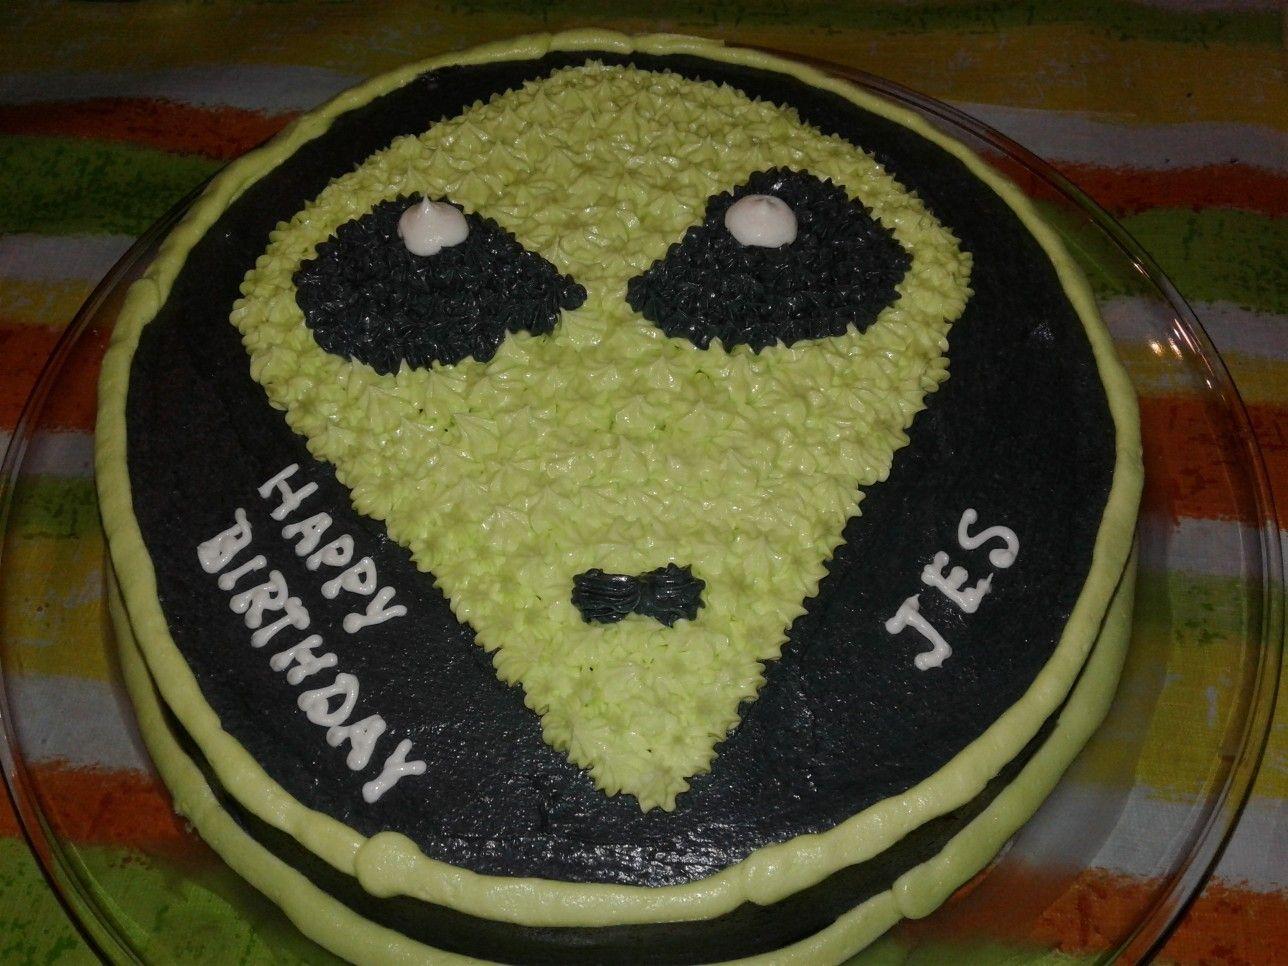 Outstanding Alien Birthday Cake Valentines Cupcakes Cake Birthday Cake Funny Birthday Cards Online Elaedamsfinfo